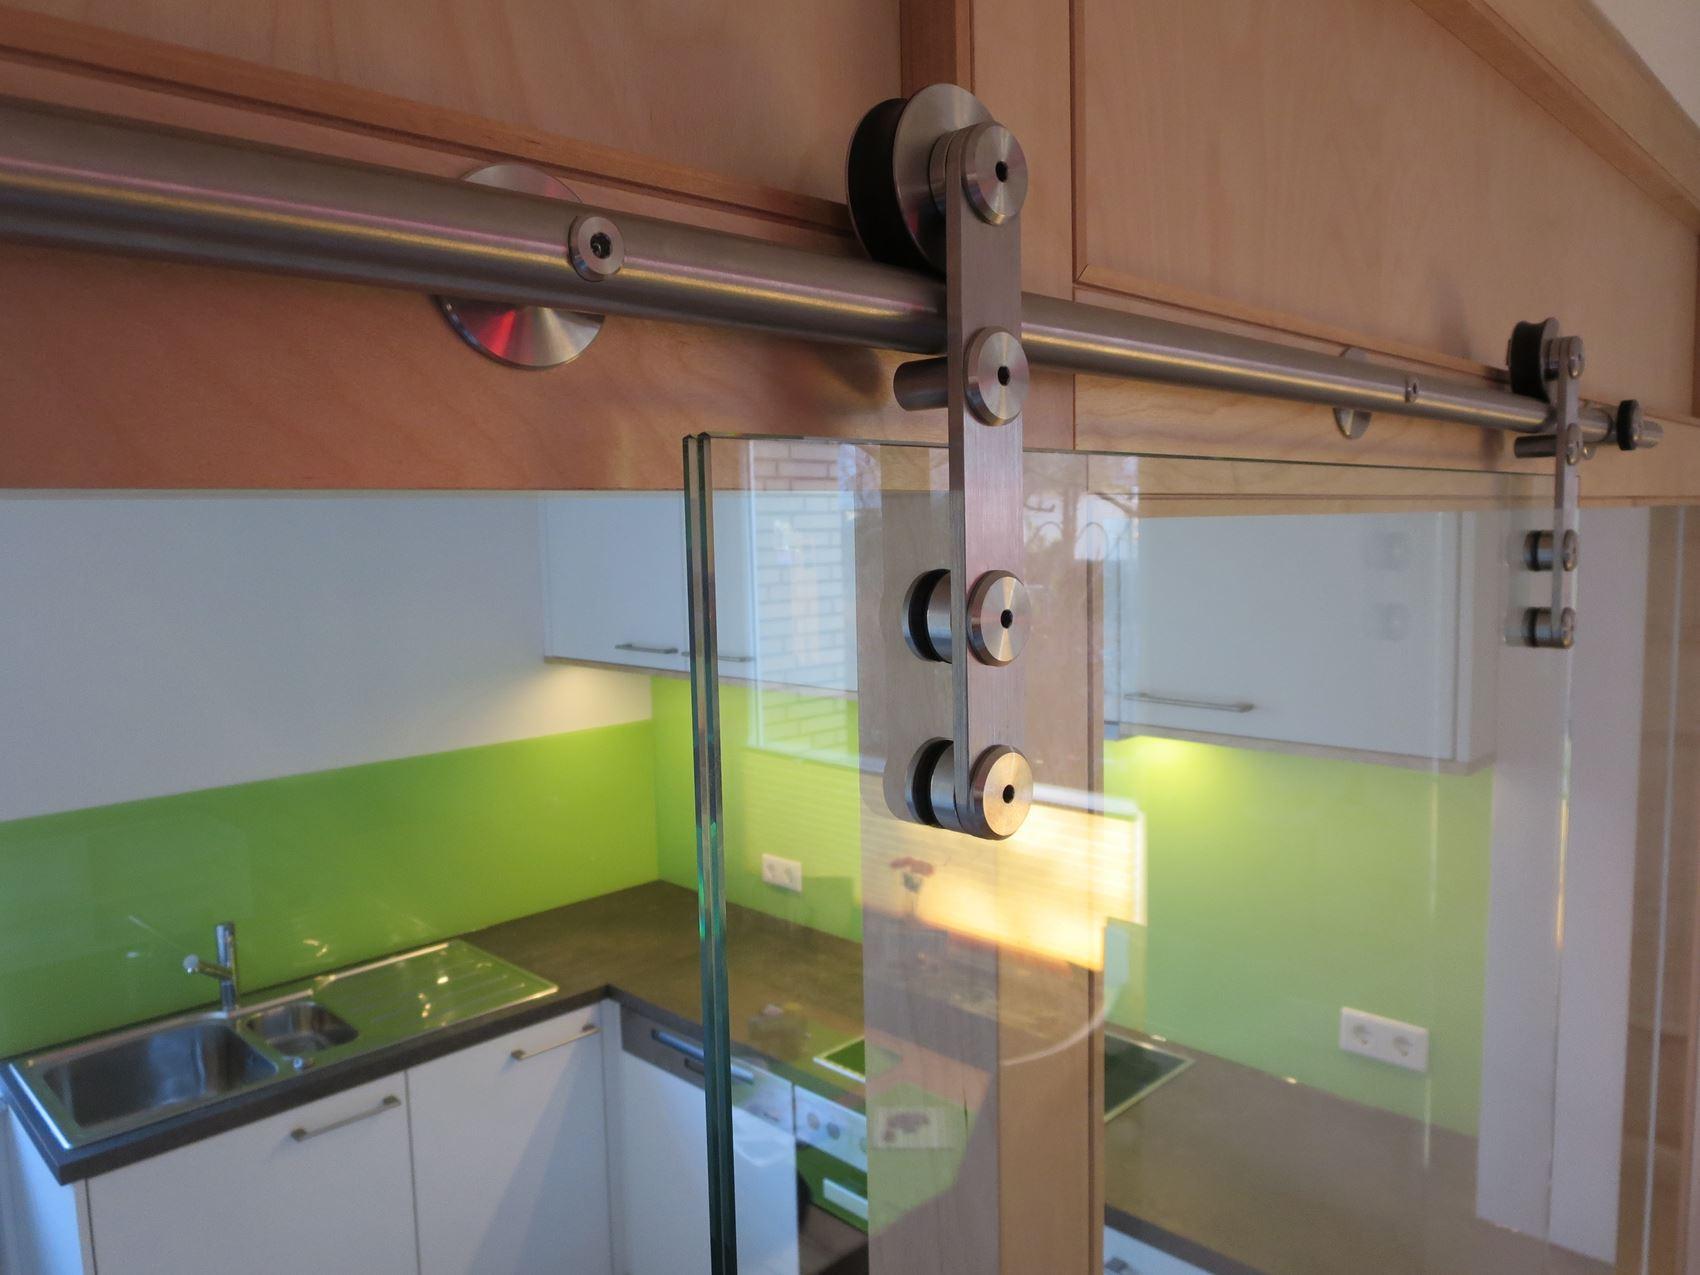 glasschiebetuer raumtrenner hamburger m bel. Black Bedroom Furniture Sets. Home Design Ideas